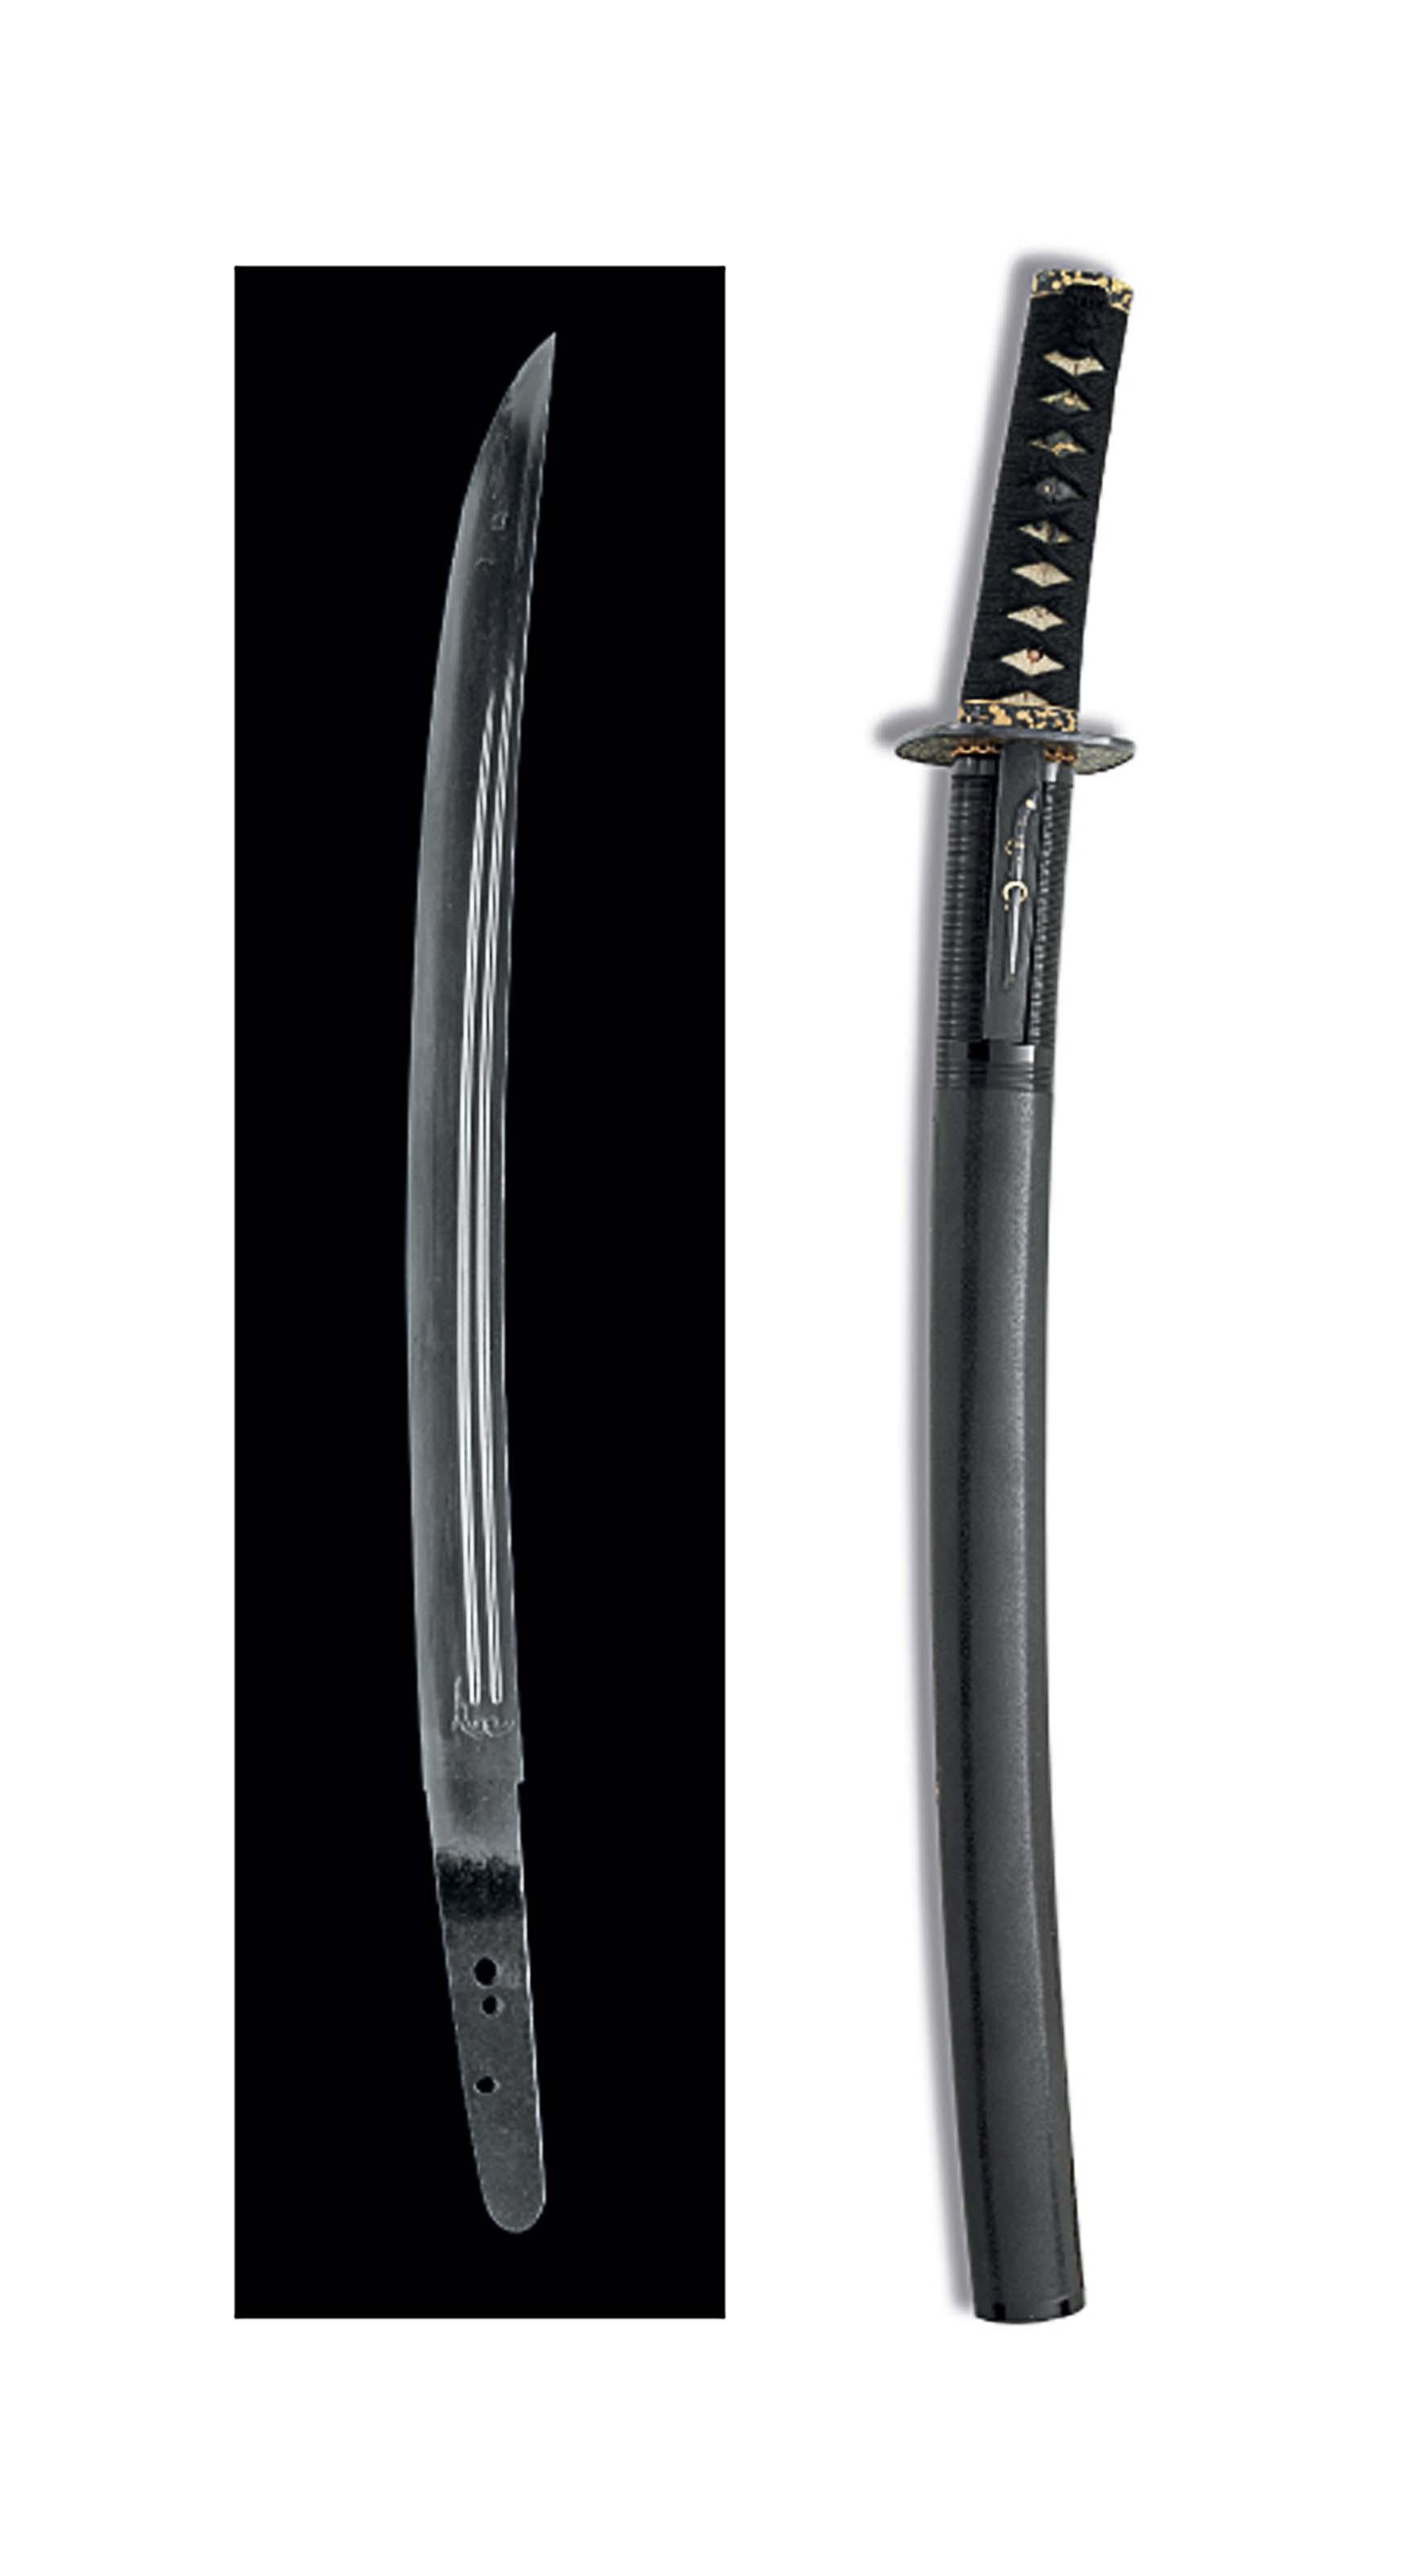 A mounted wakizashi